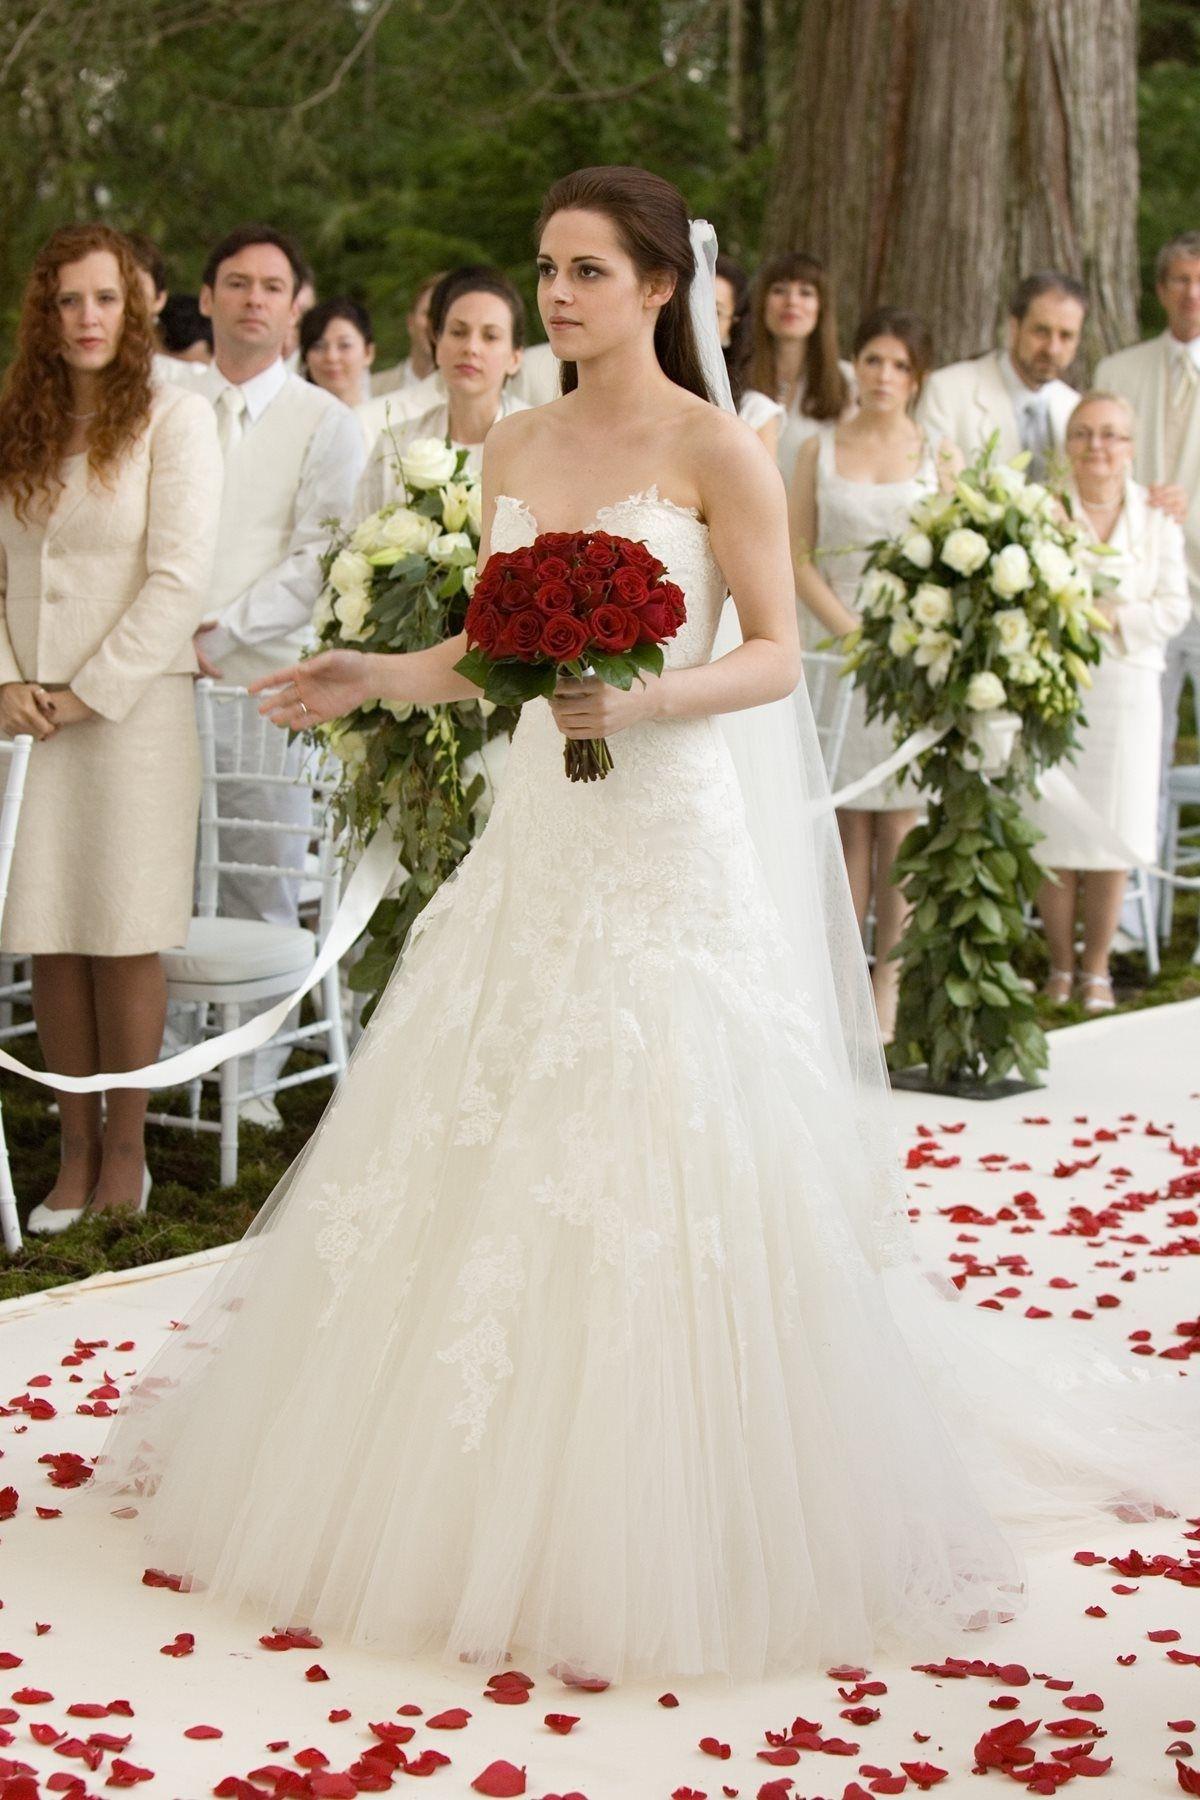 Bella Swan Wedding Dress In Her Dream Twilight Wedding Dresses Twilight Wedding Dress Twilight